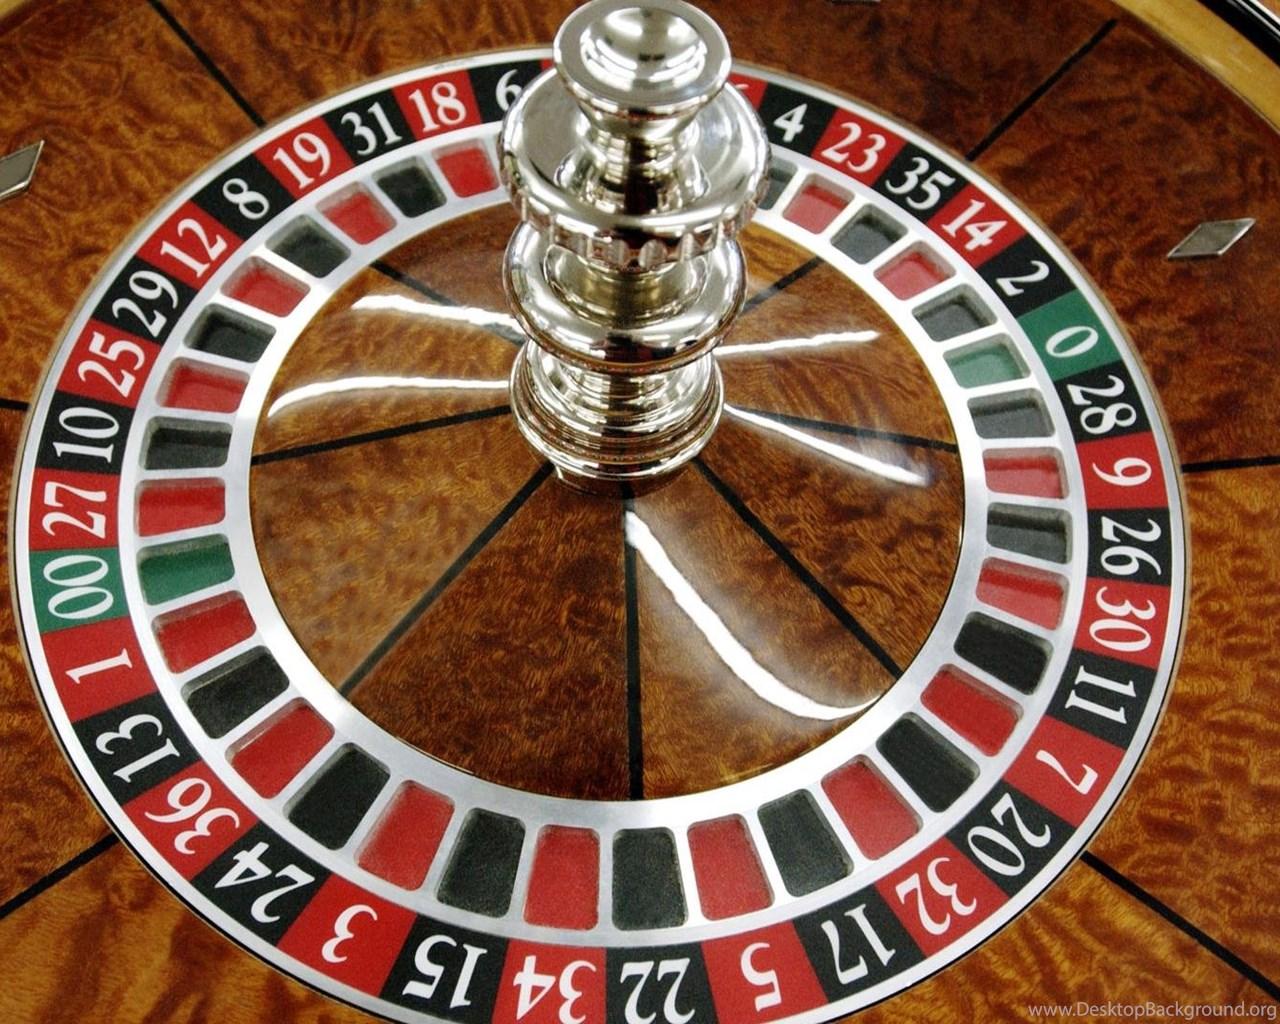 Bandarqq Betting: Earn While Having Fun post thumbnail image